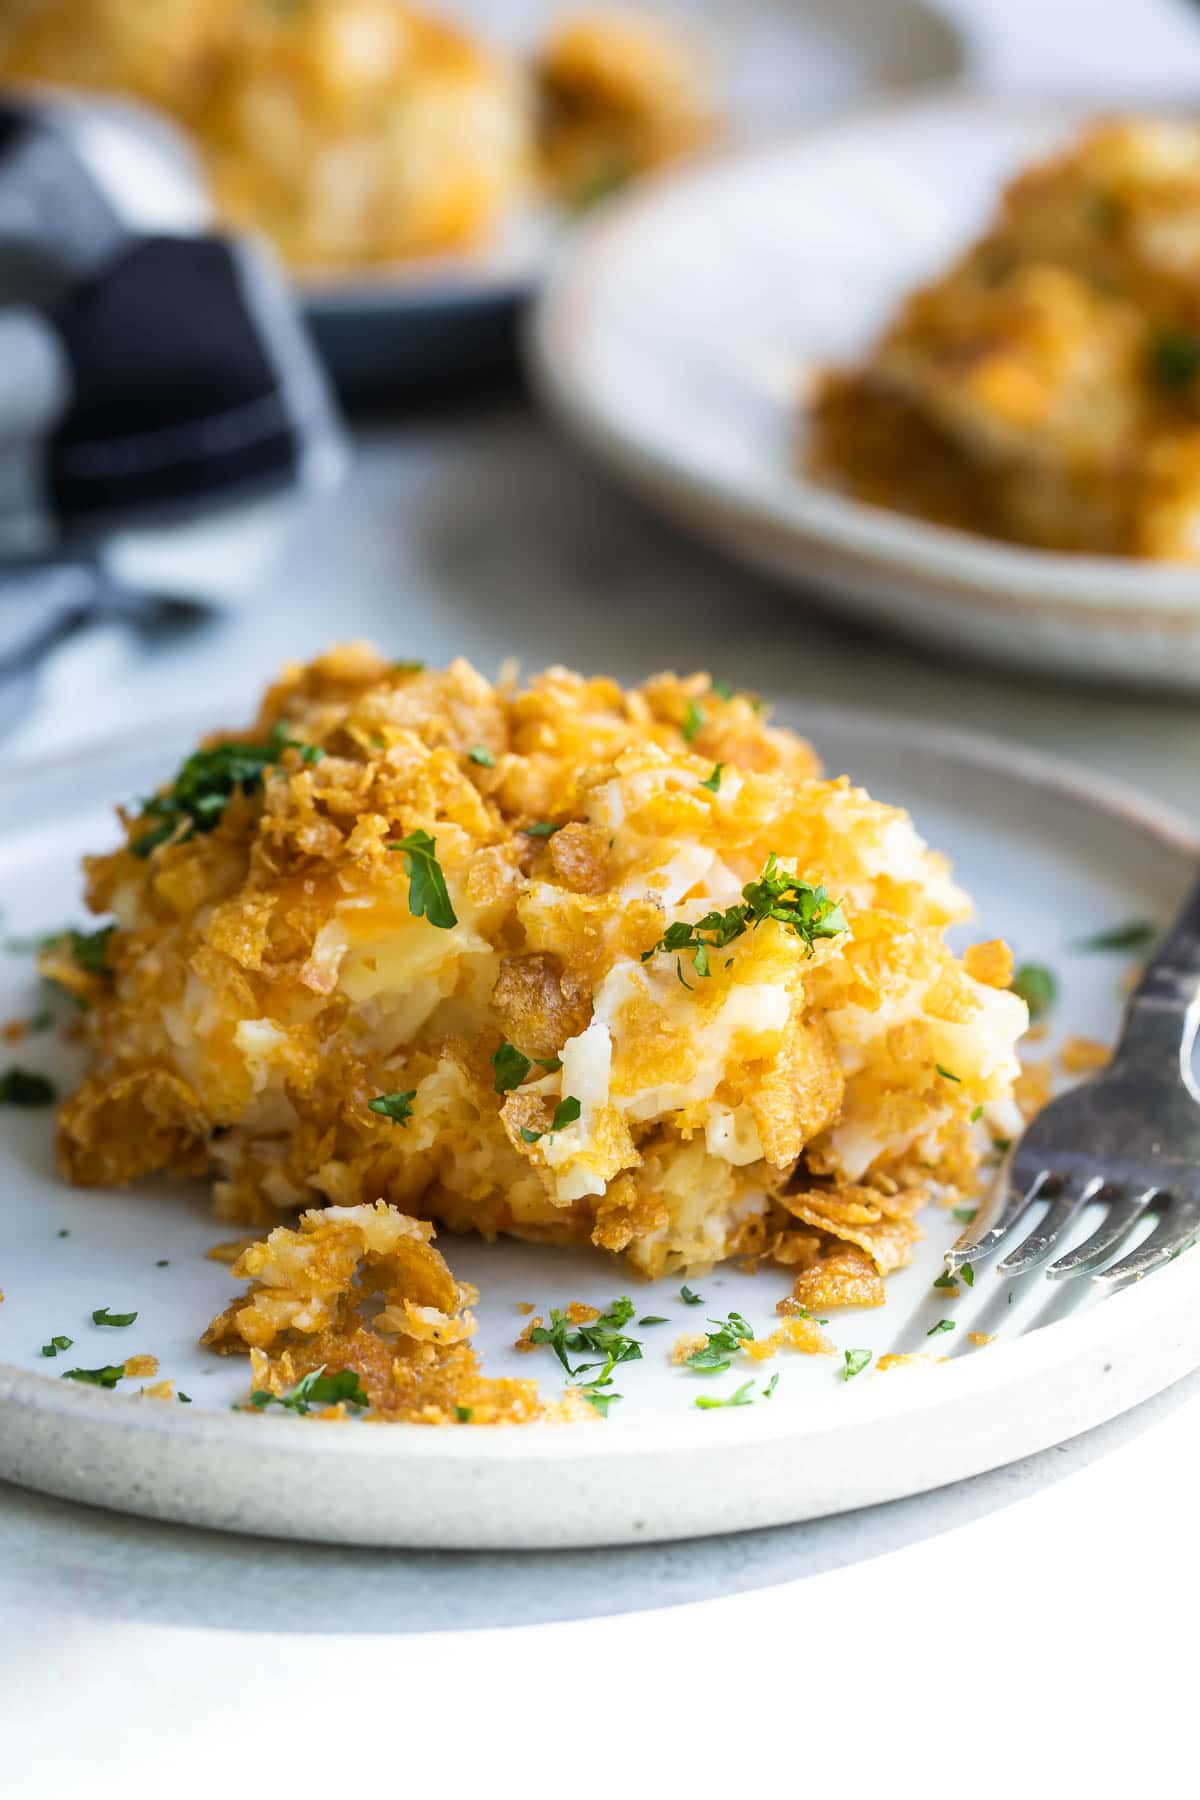 A pile of cheesy potato casserole on a plate.